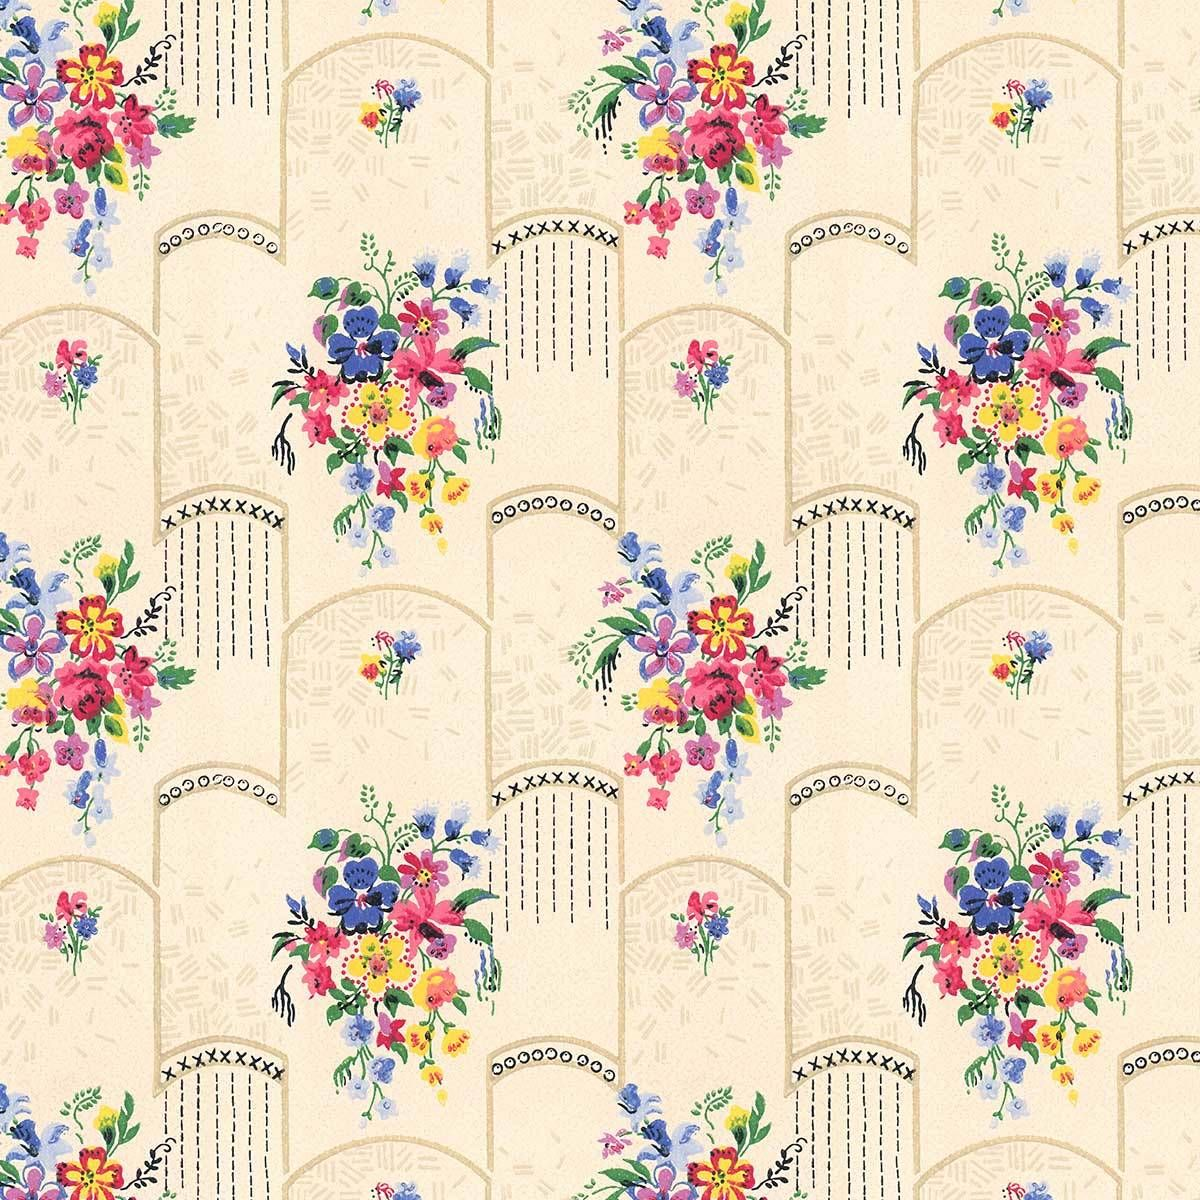 Deco Lane DesignYourWall Wallpaper, Vintage wallpaper